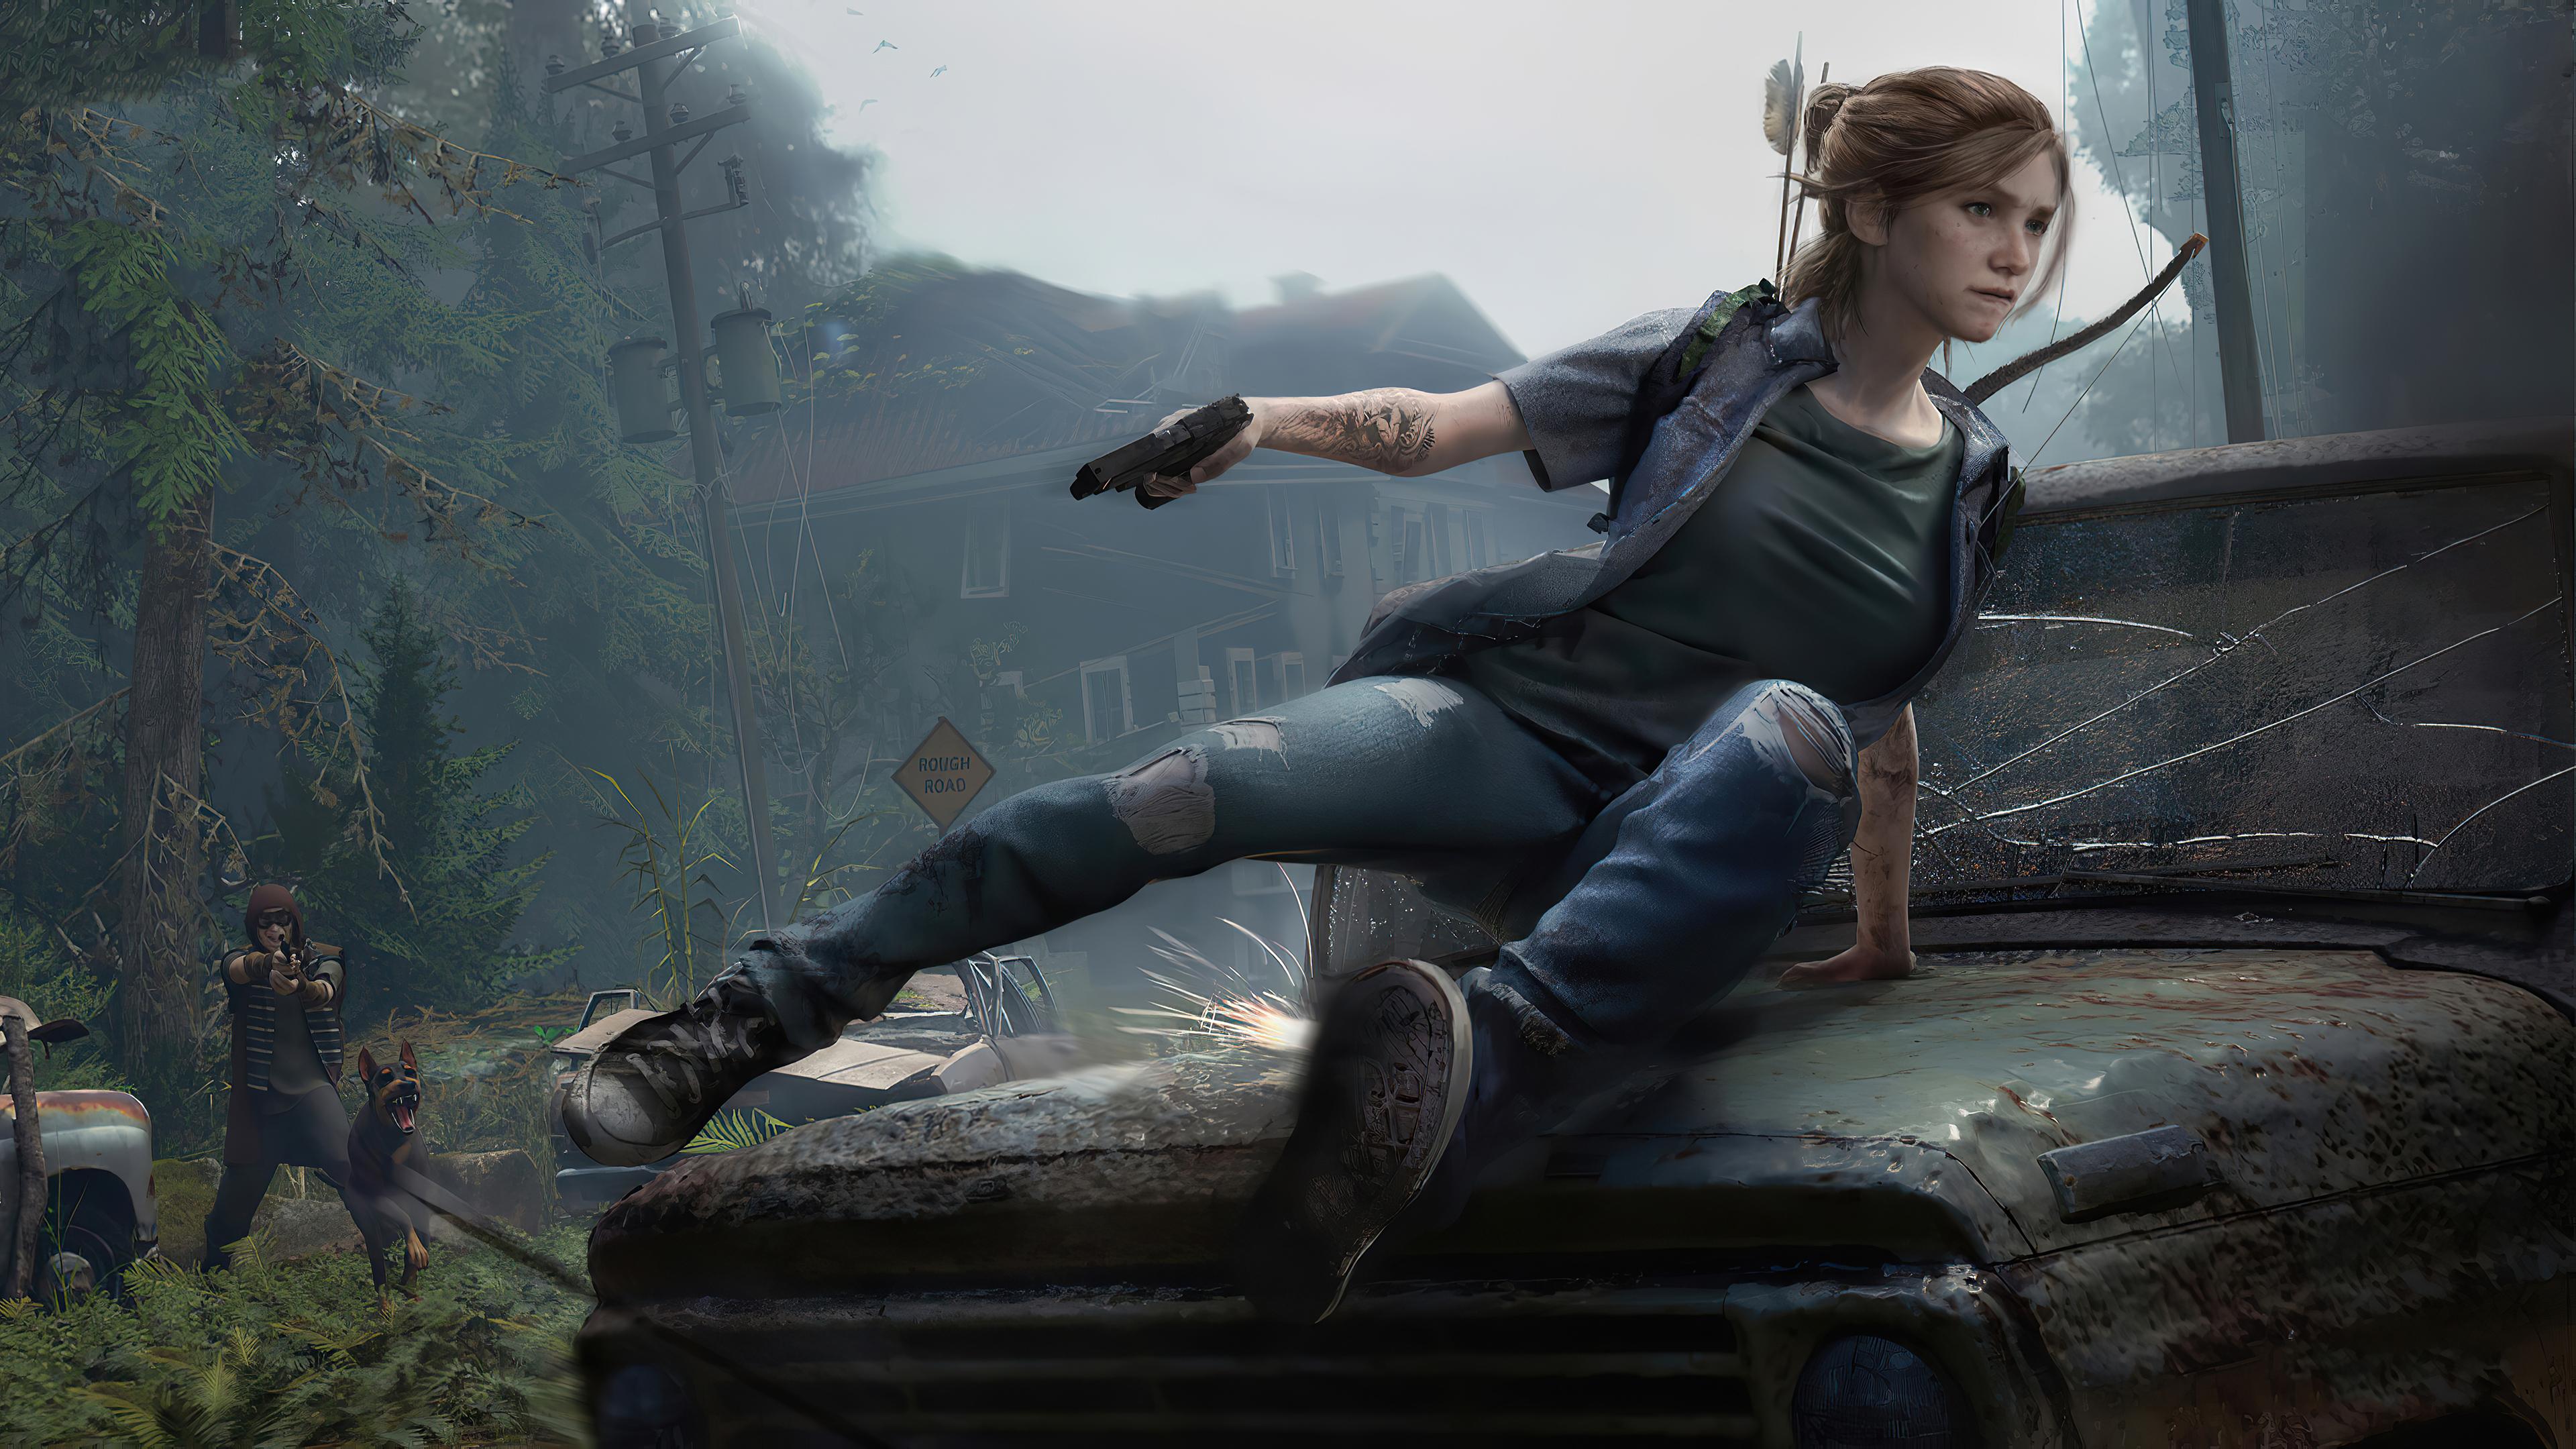 New Ellie The Last of Us 2 Wallpaper, HD Games 4K ...